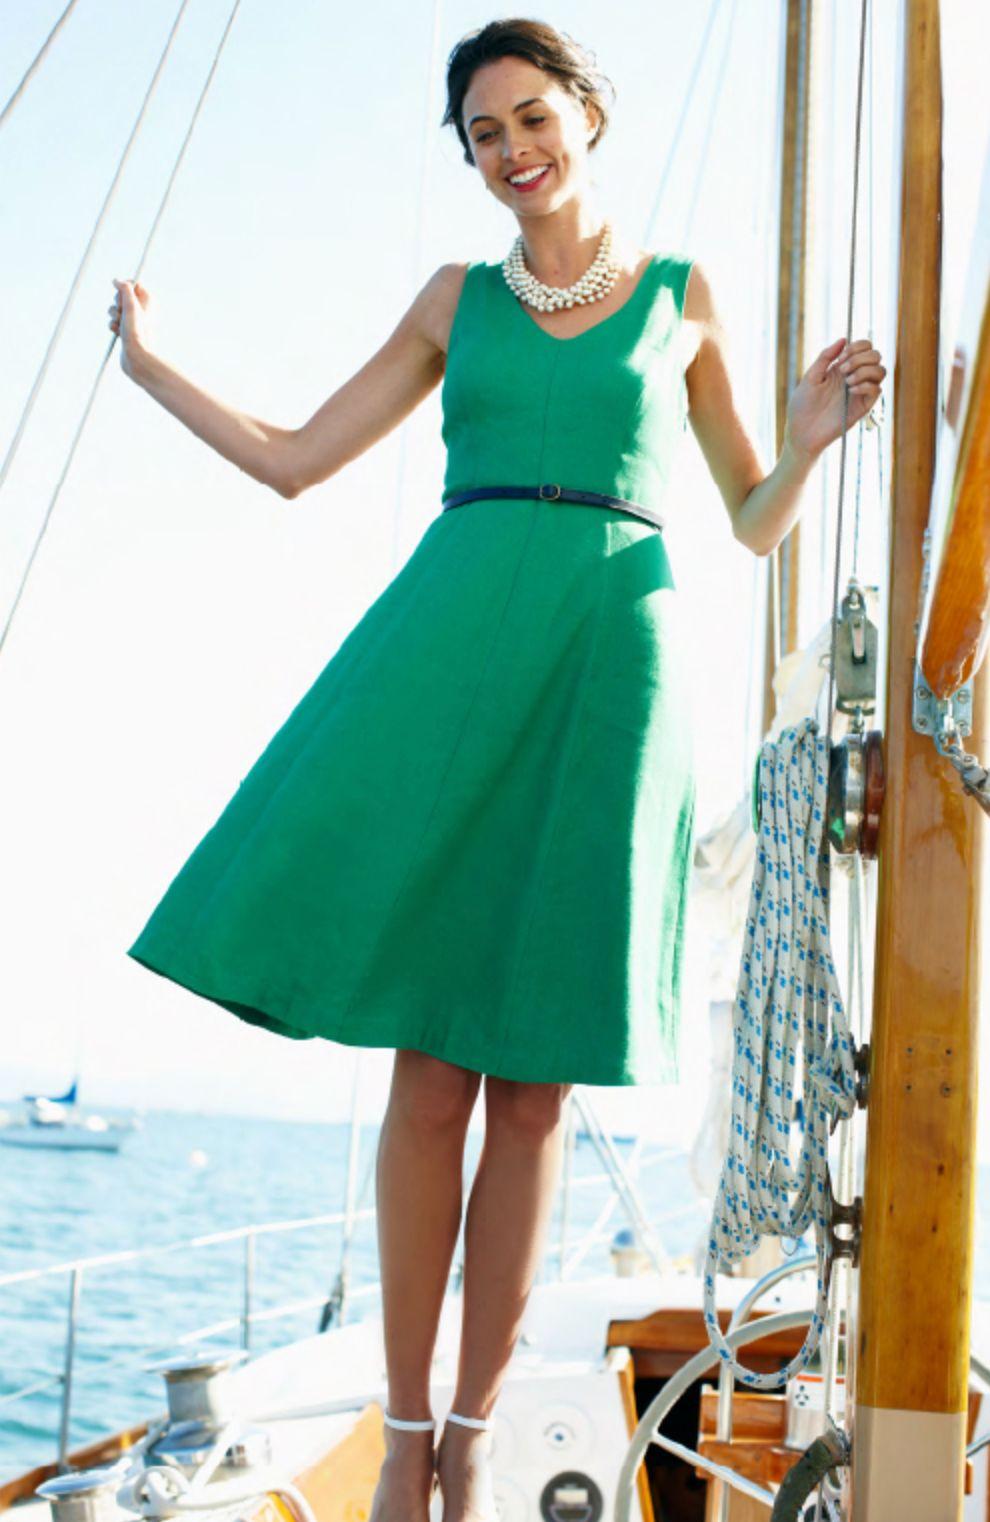 LE SB Green dress.jpg